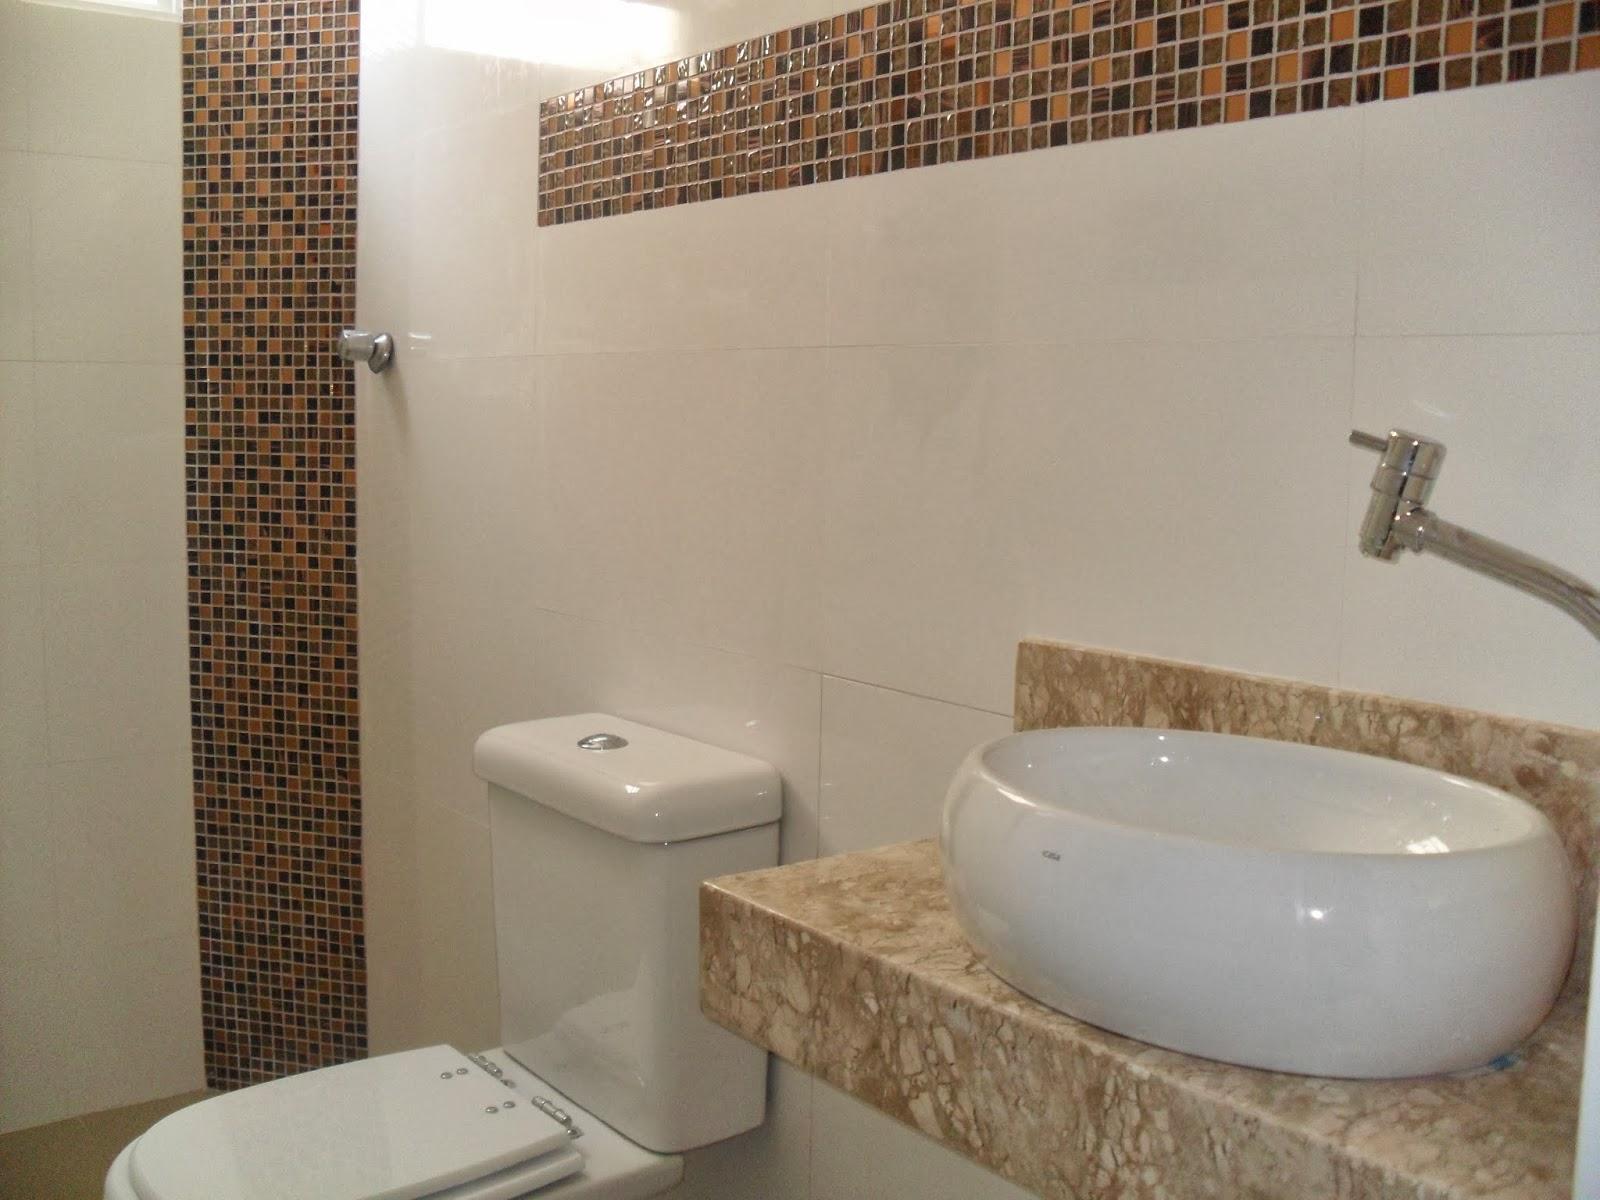 banheiro pastilhas bege 6 Car Tuning #90613B 1600x1200 Banheiro Bancada Bege Bahia